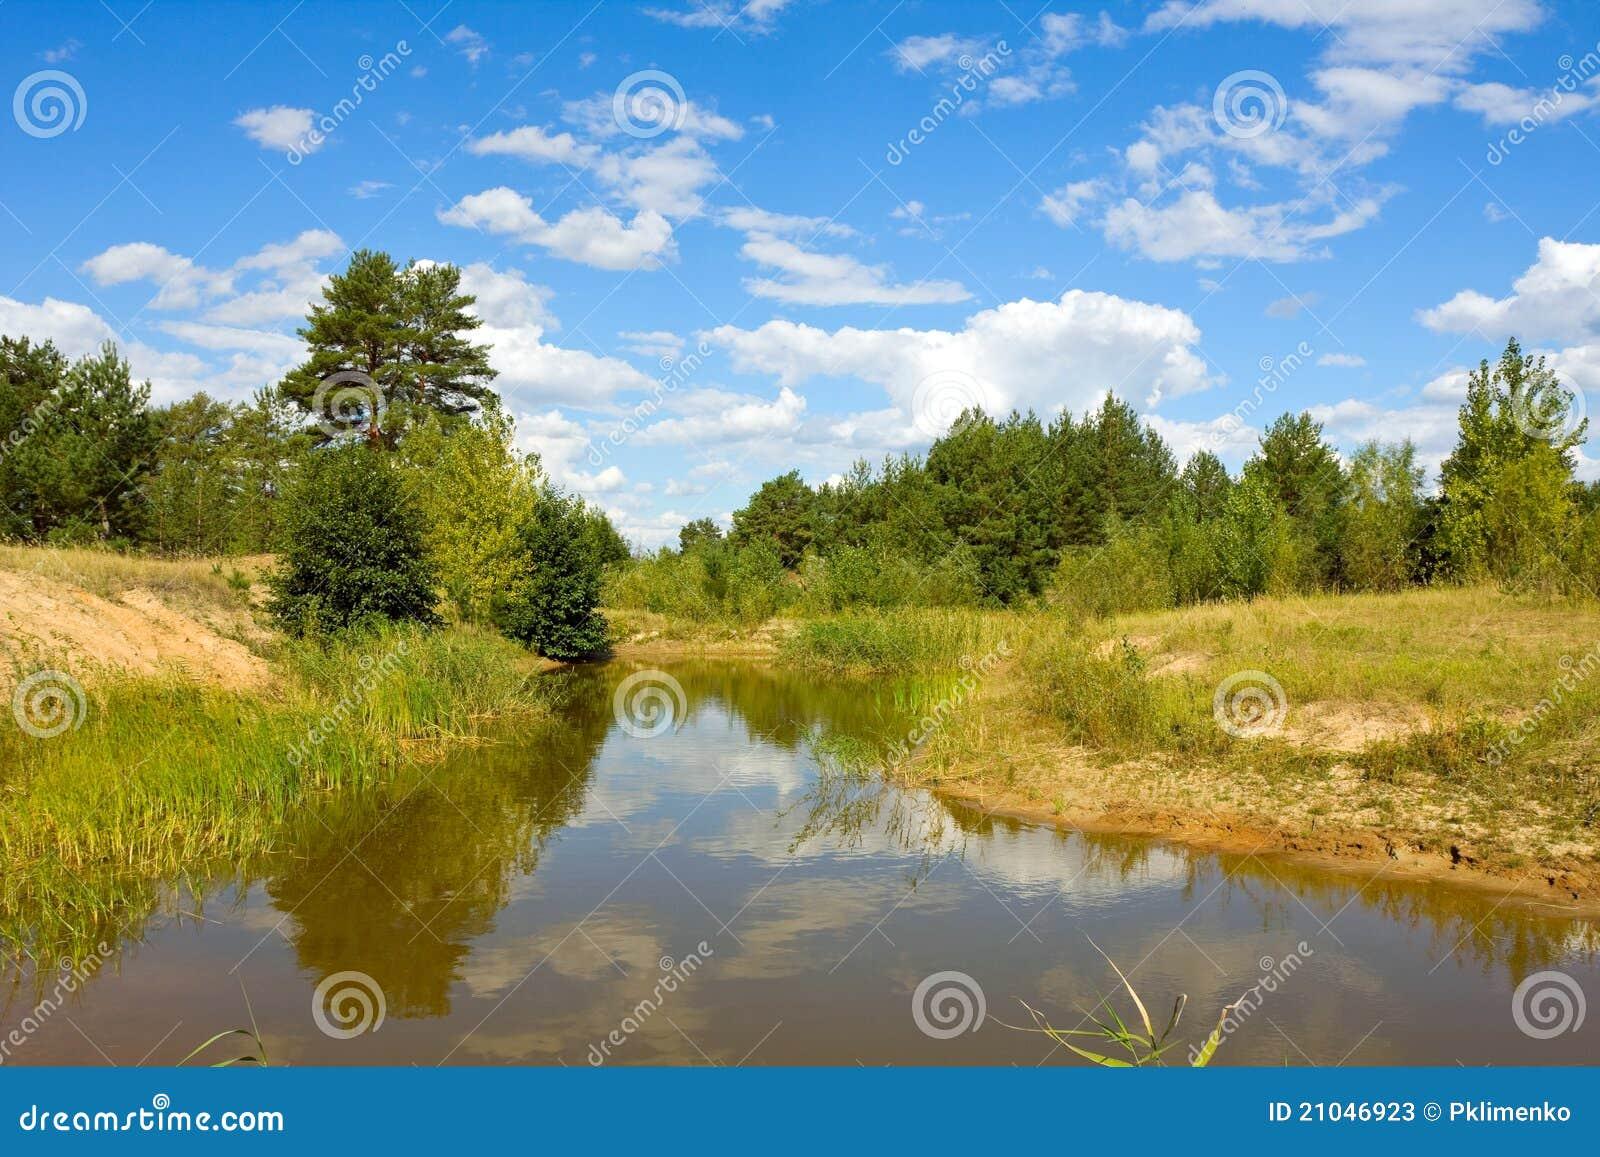 Forest pond stock image 25320475 for Pond dealers